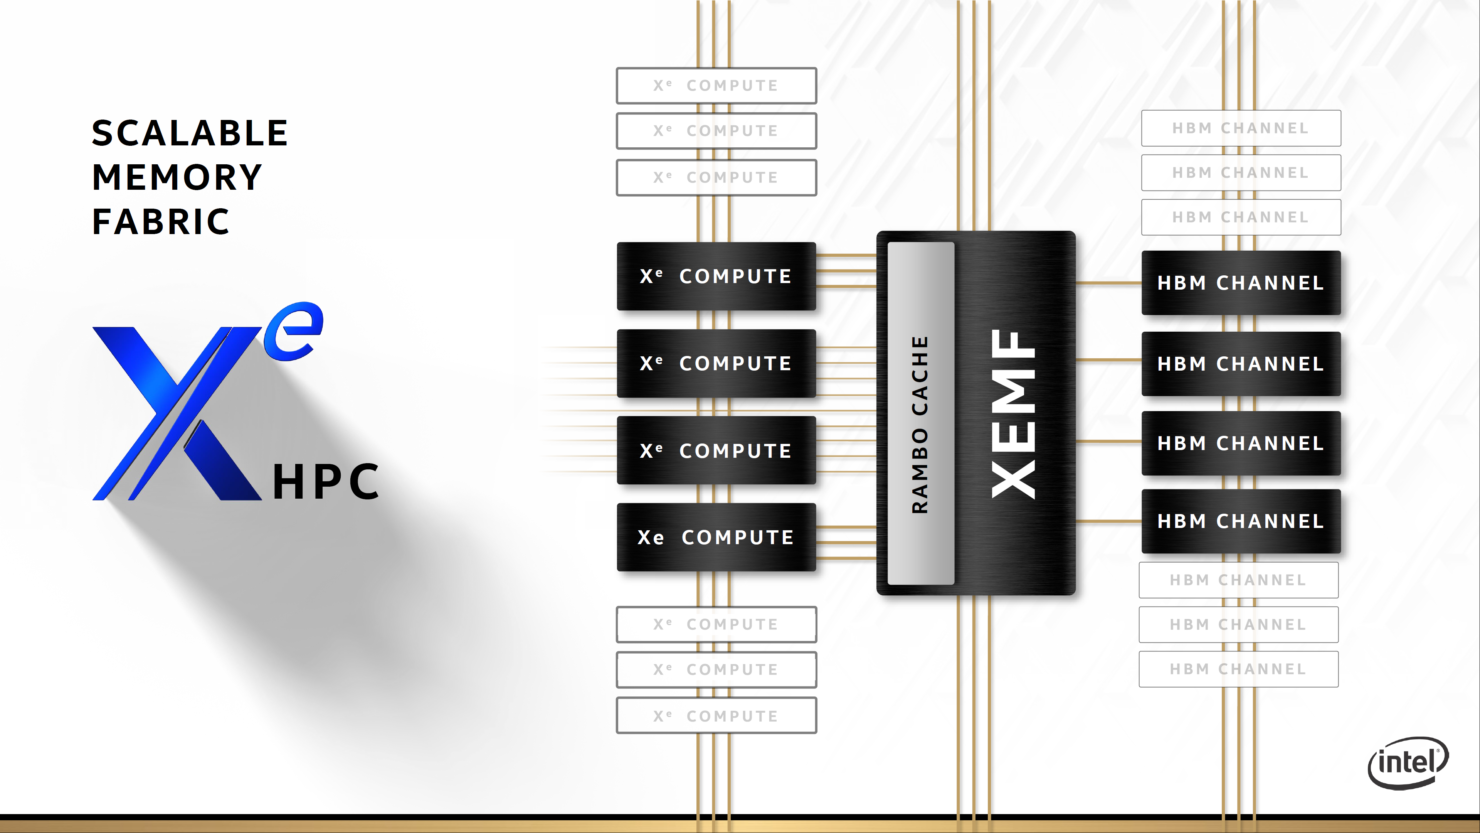 intel-xe-hpc-gpu_ponte-vecchio_architecture_raja-koduri_19